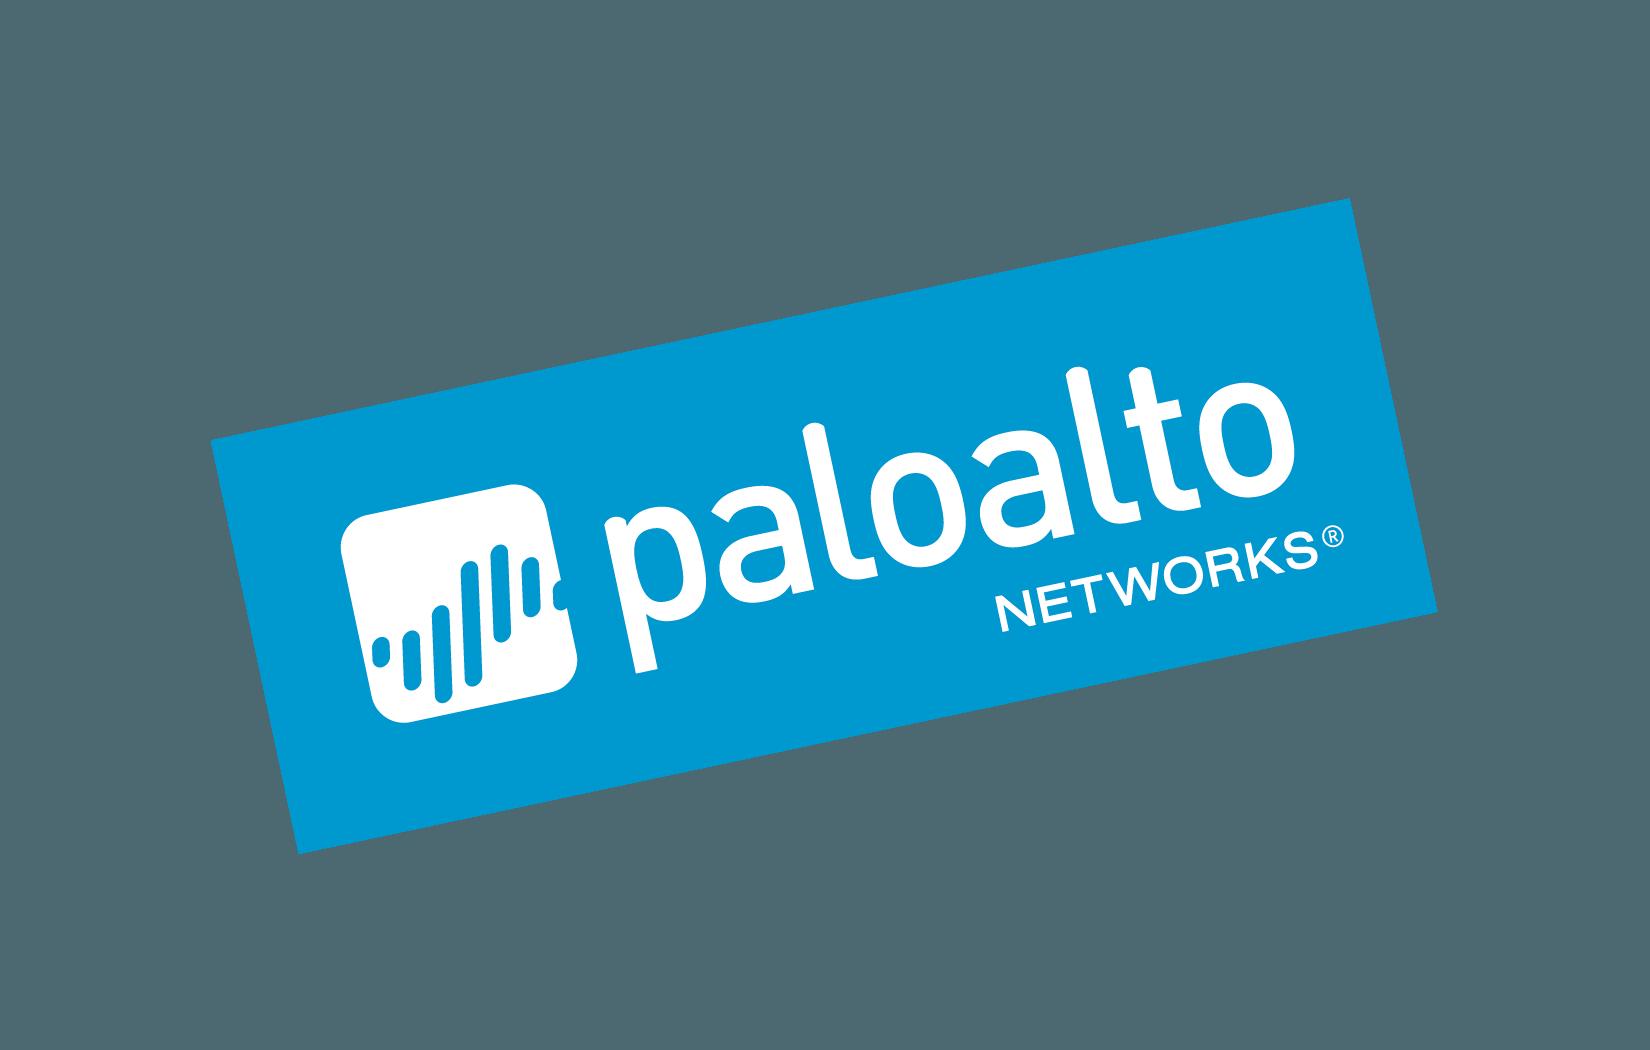 Palo alto networks incnysepanw palo alto networks inc shares palo alto networks inc shares crater 18 on extremely weak guidance biocorpaavc